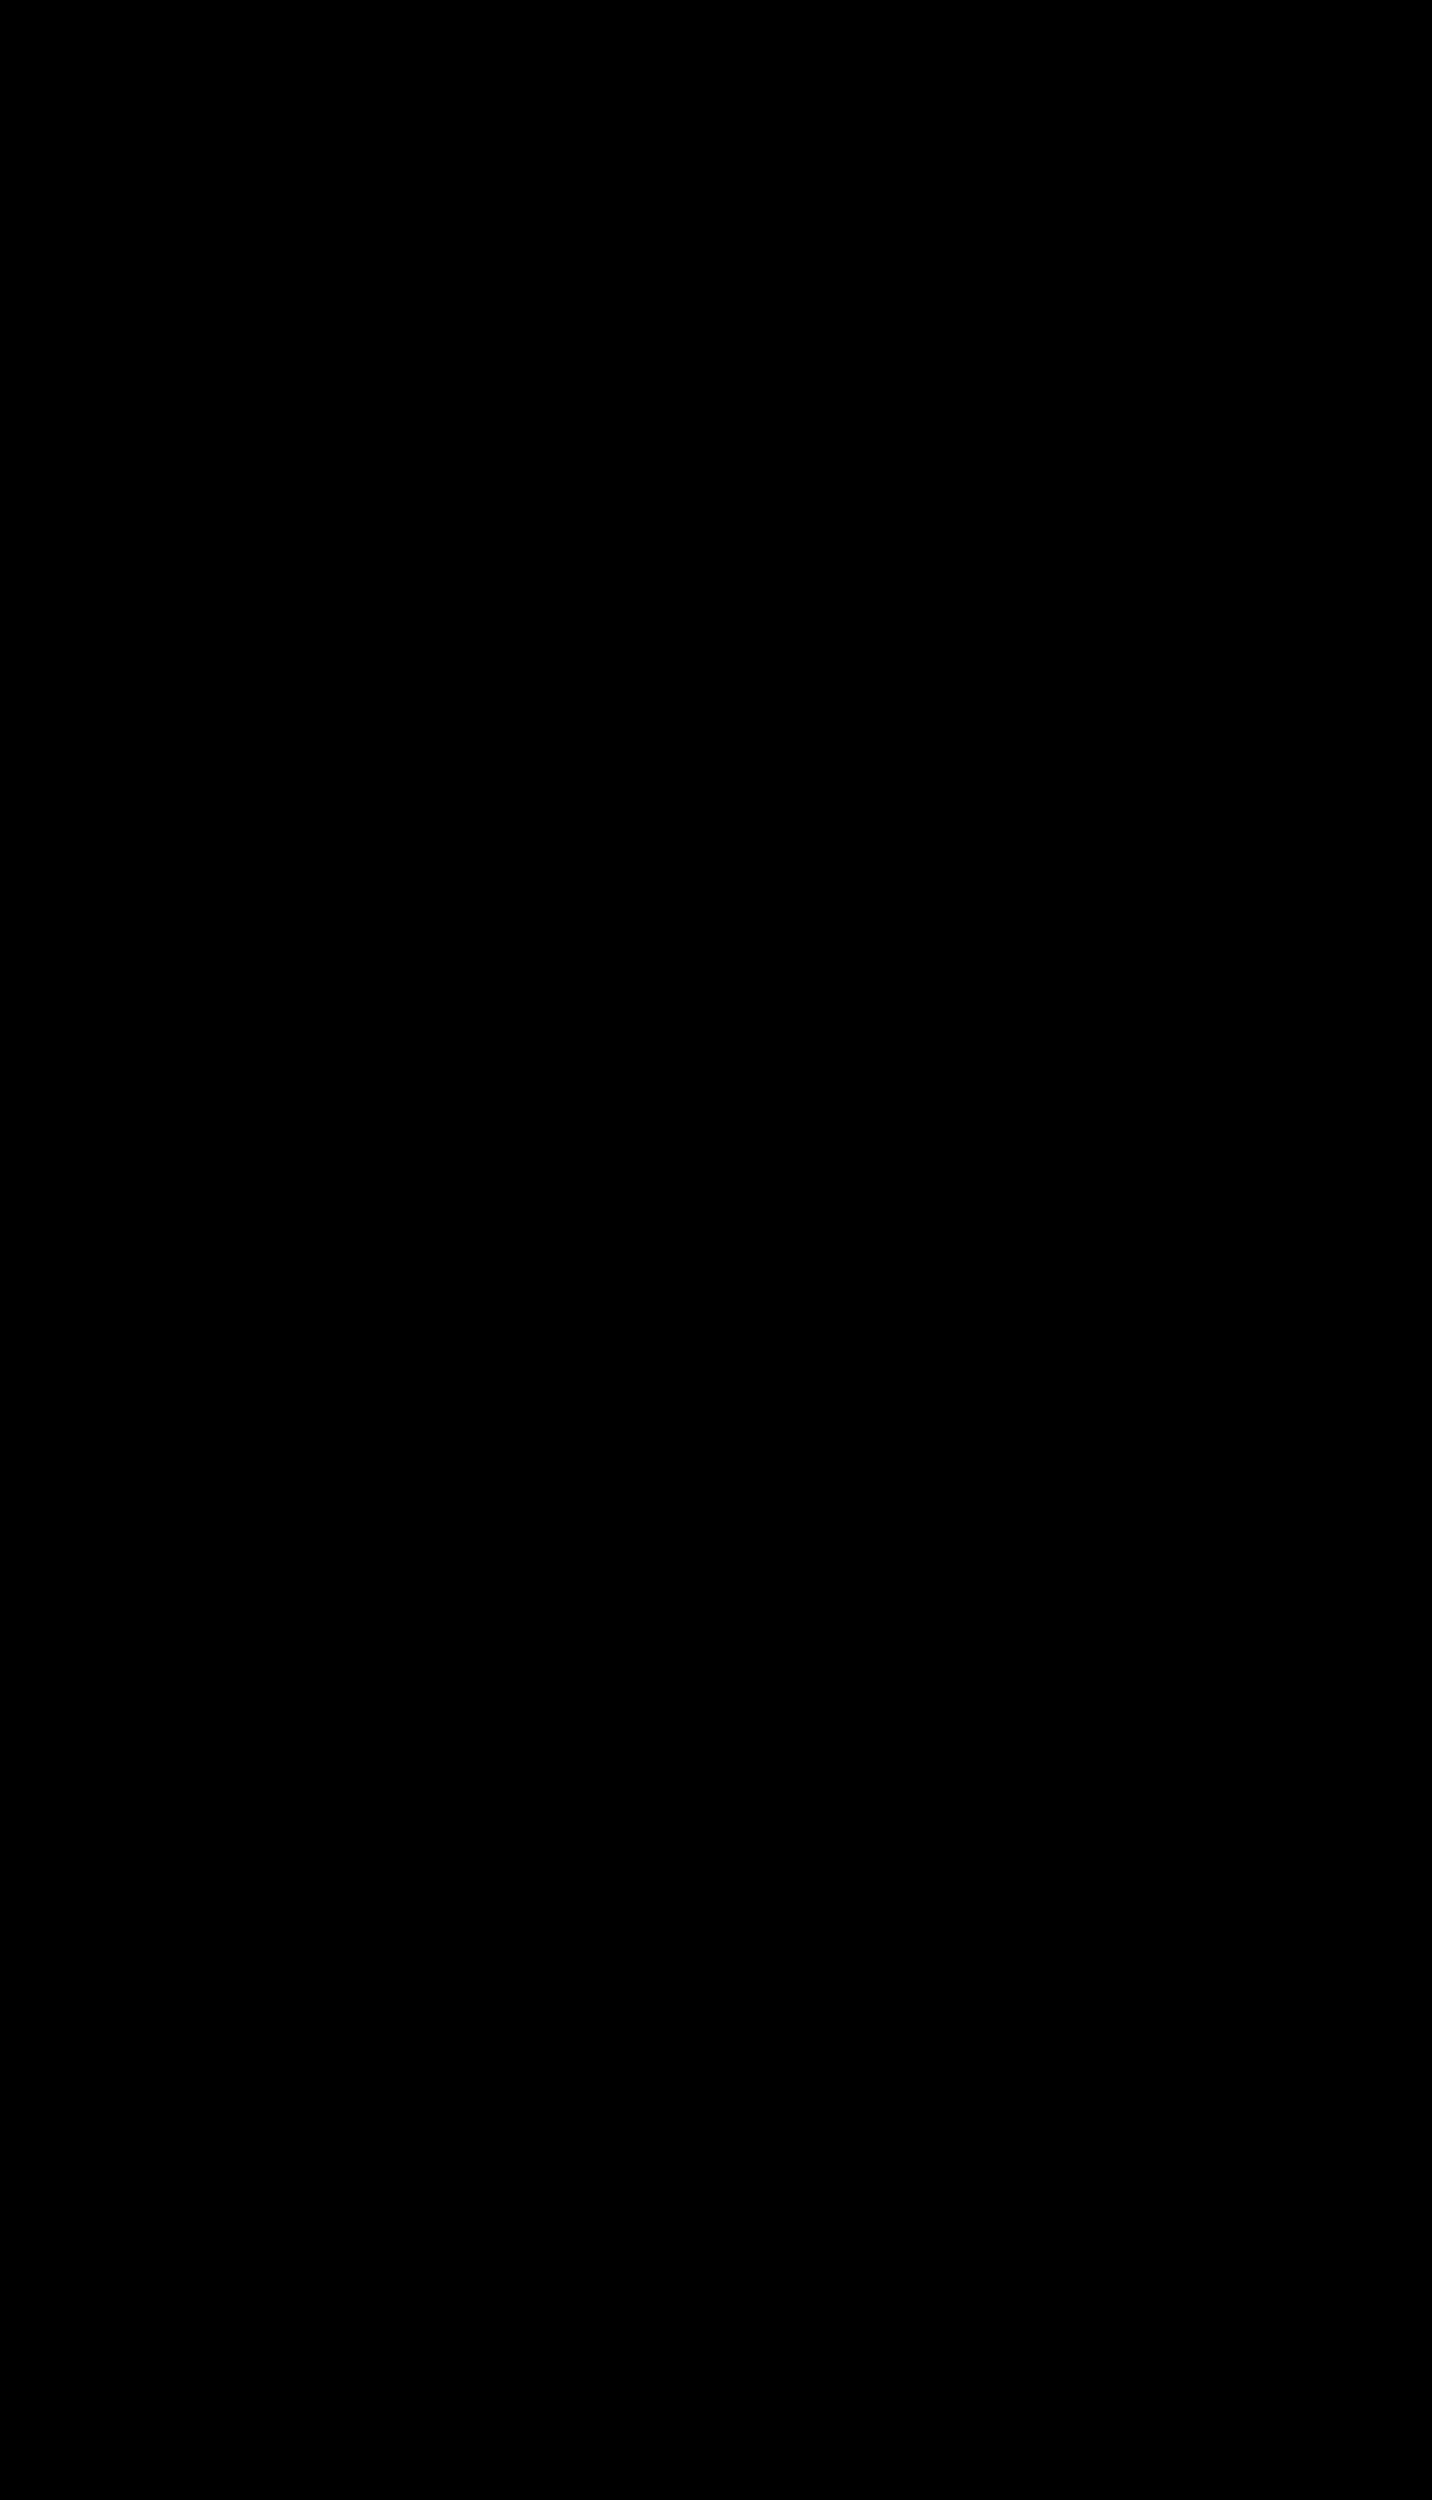 Ama Black Vector PNG - 107790